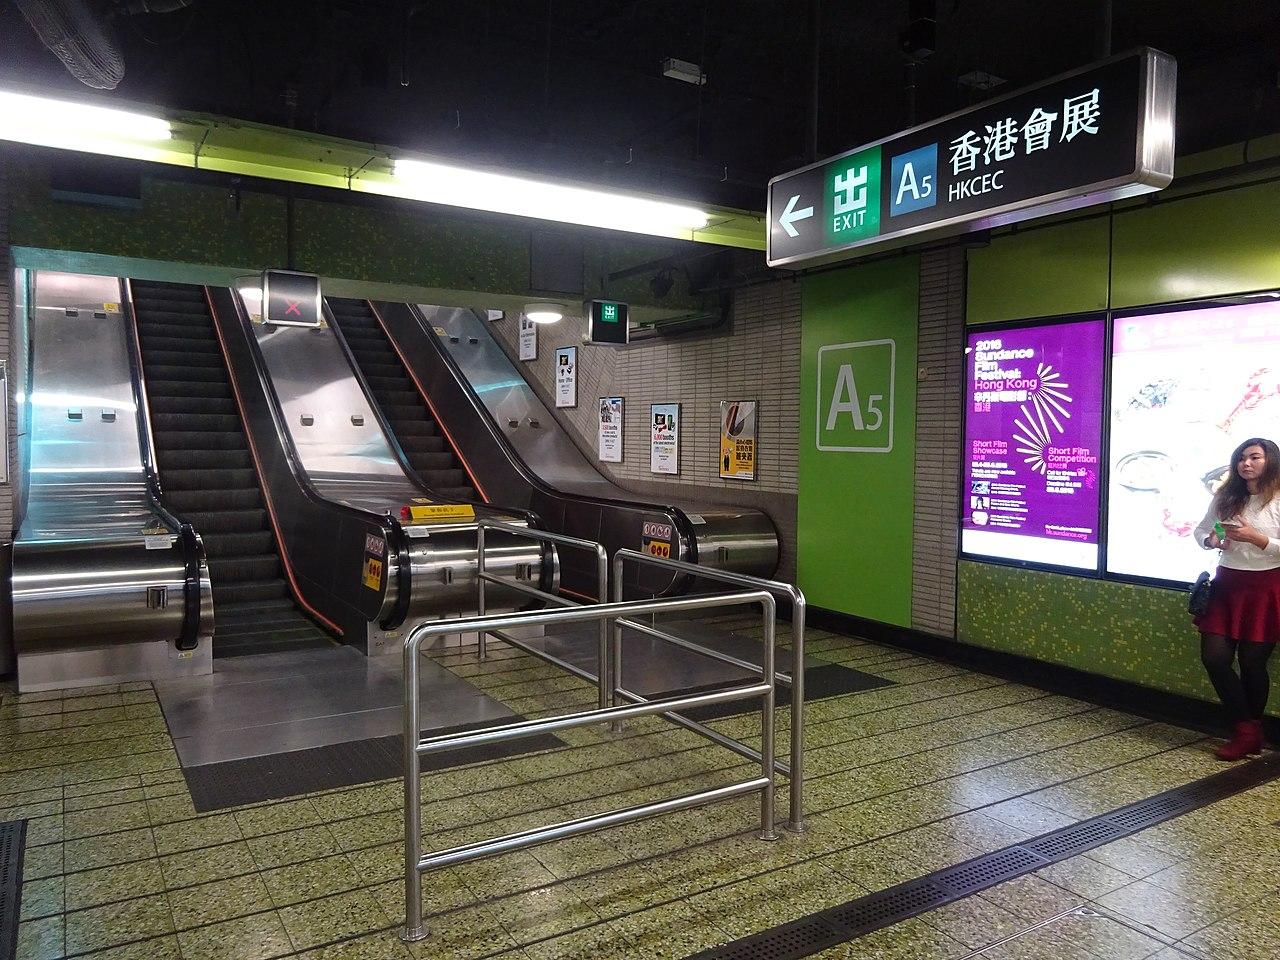 File:HK MTR Wan Chai Station interior escalators April 2016 DSC (3).JPG - Wikimedia Commons